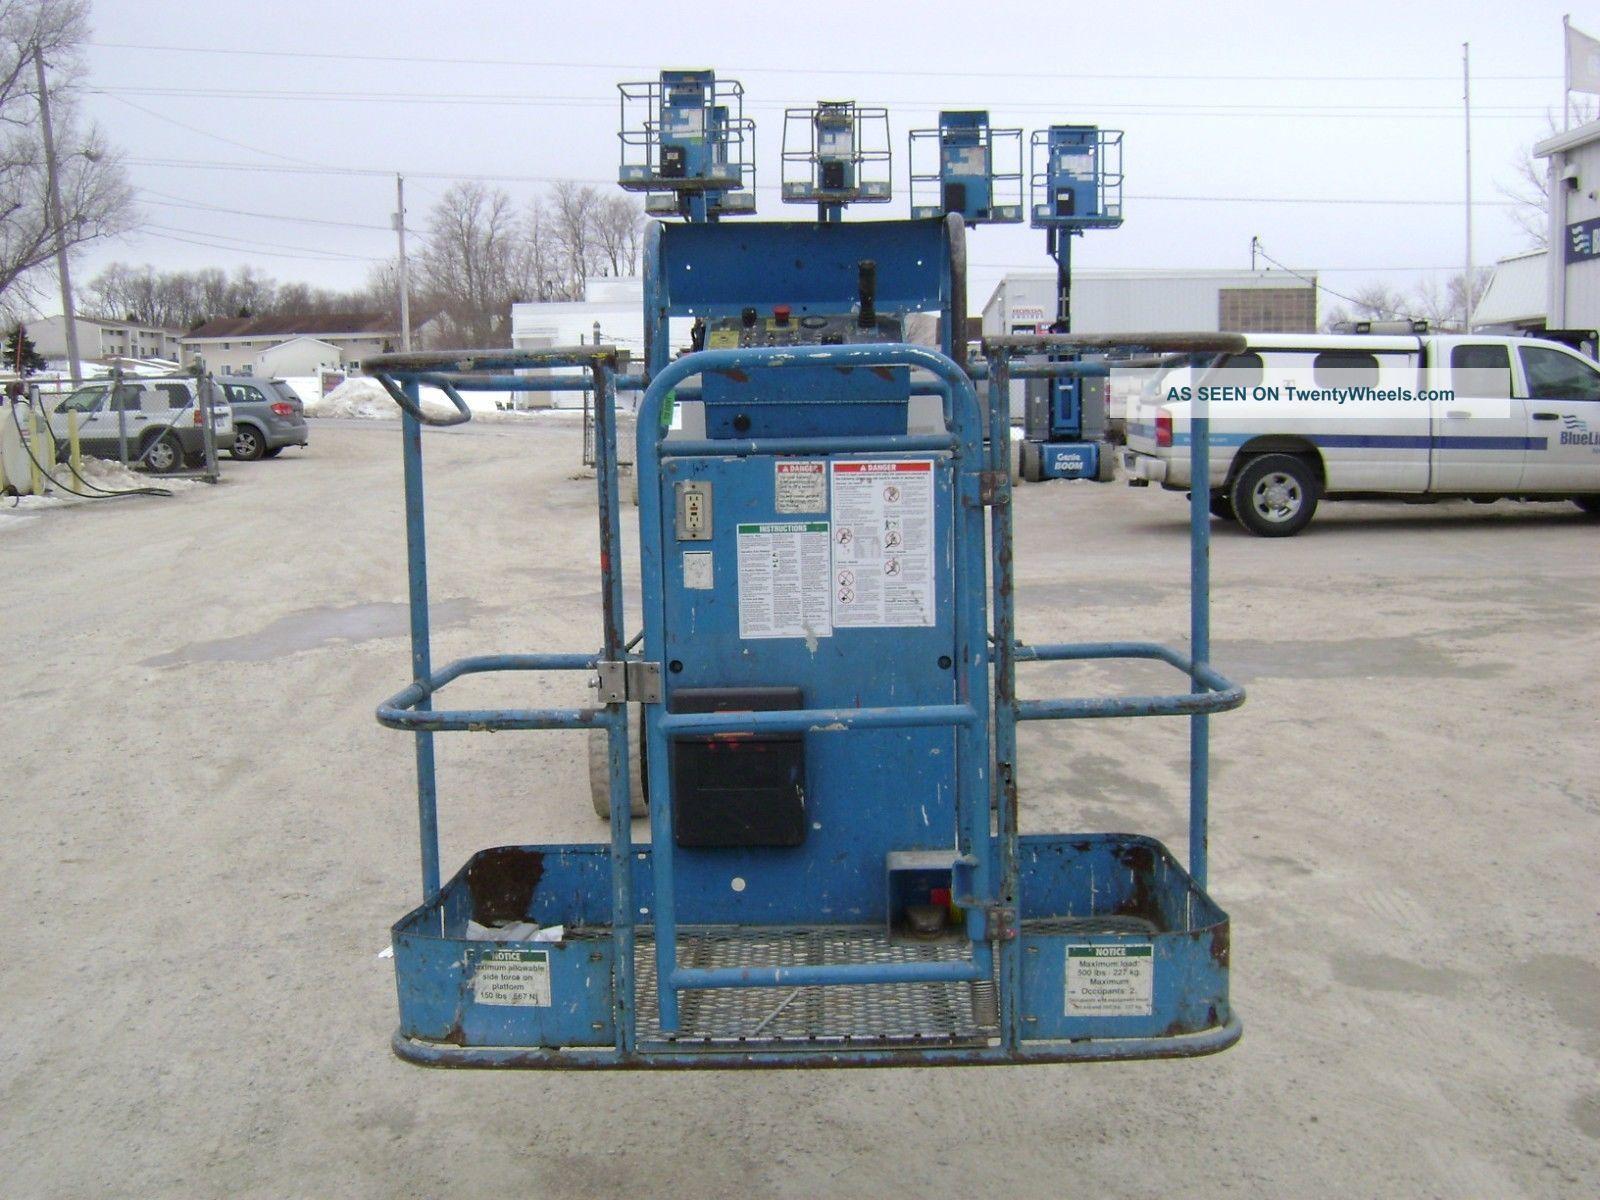 Narrow Articulating Boom Lift : Genie z n narrow articulating boom lift work